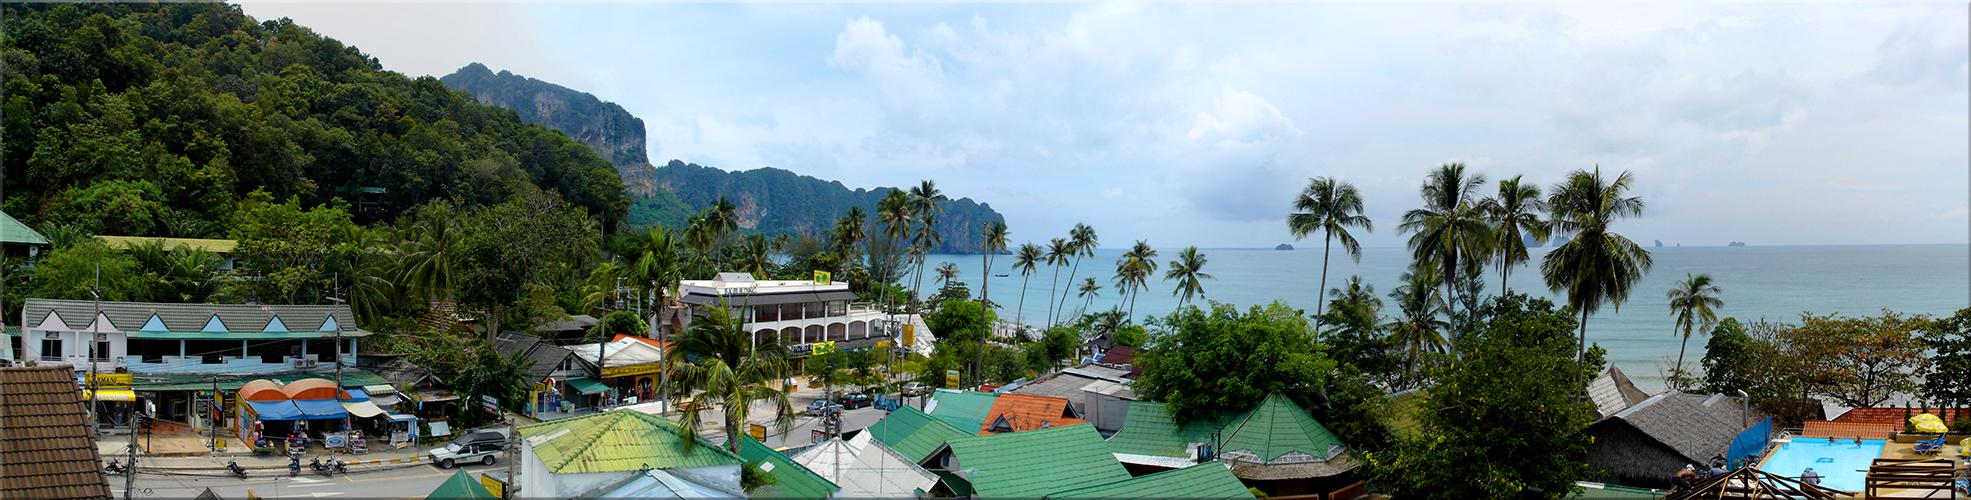 Krabi Hotel View